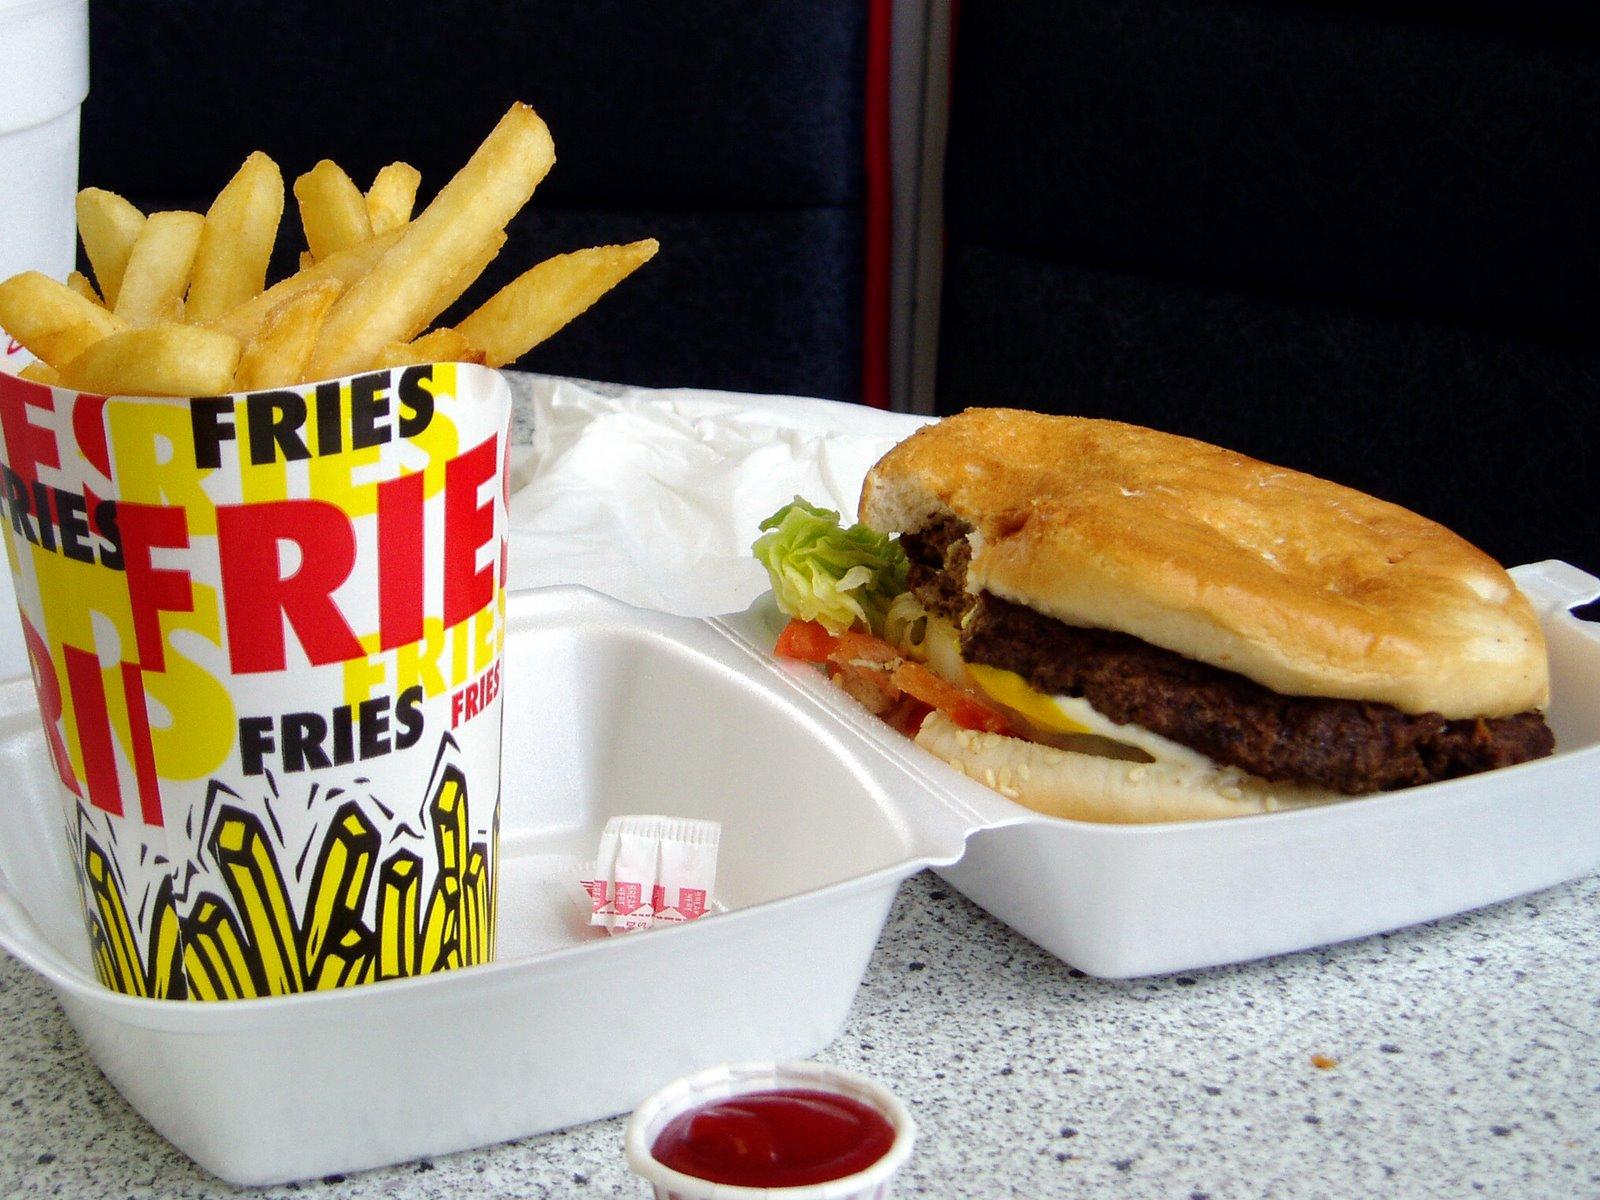 [fast-food---Cindy-Kalamajka-stock.xchng]